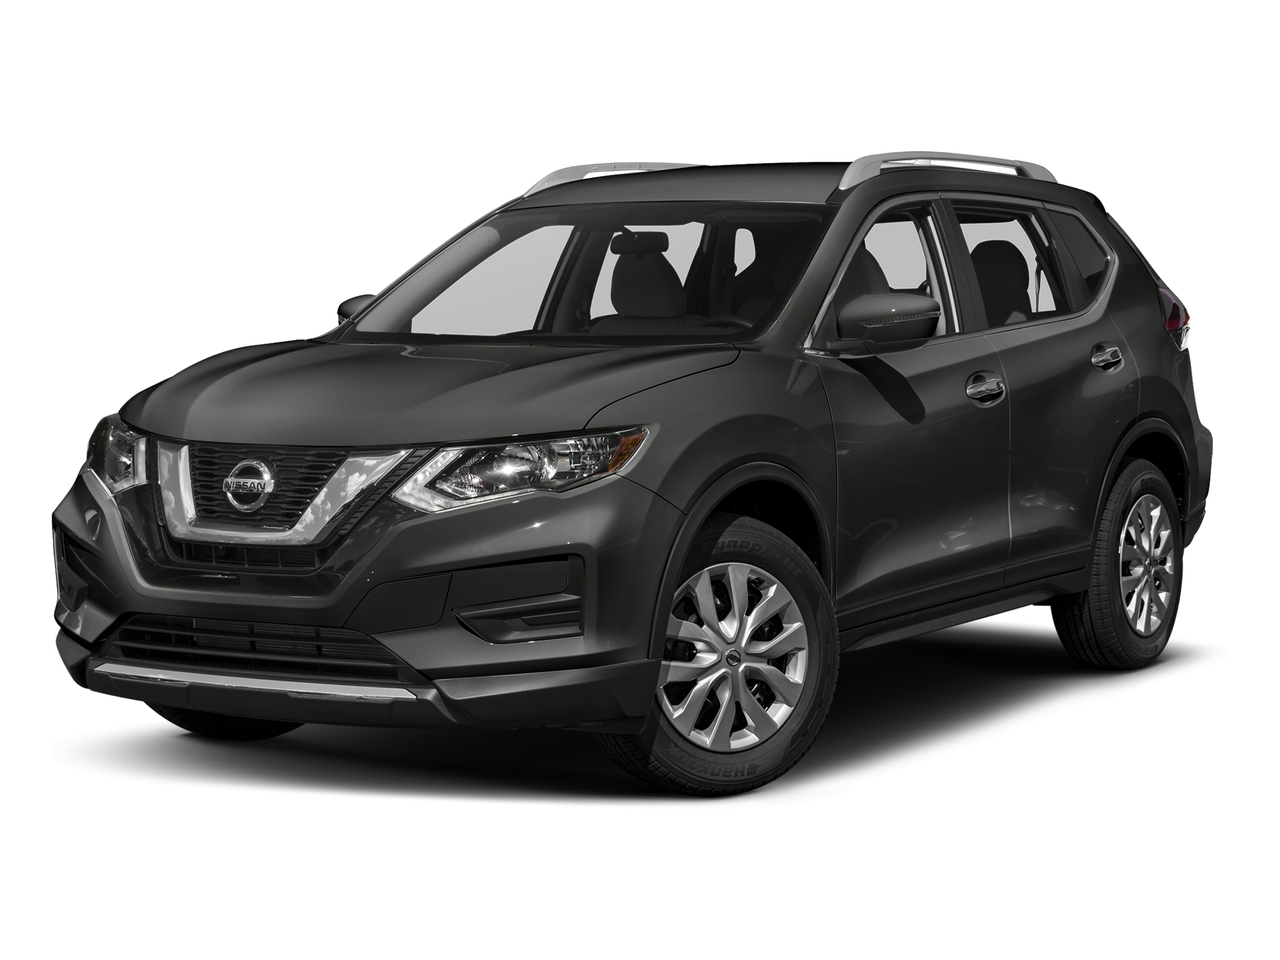 2017 Nissan Rogue SV MIDNIGHT EDITION SUV Slide